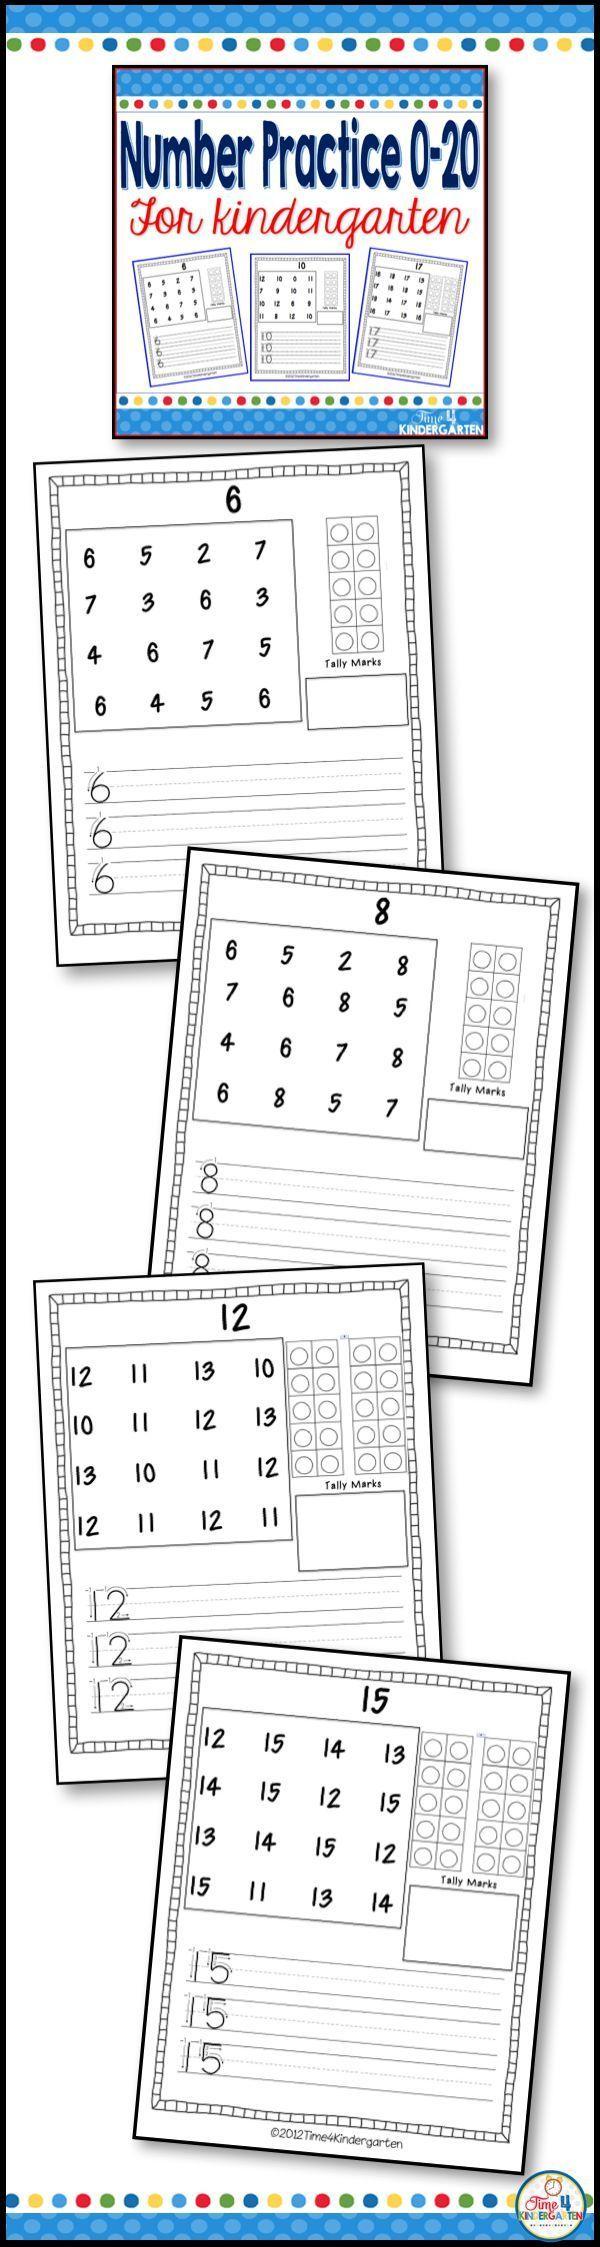 Number Practice for Kindergarten | Tally marks, Ten frames and ...